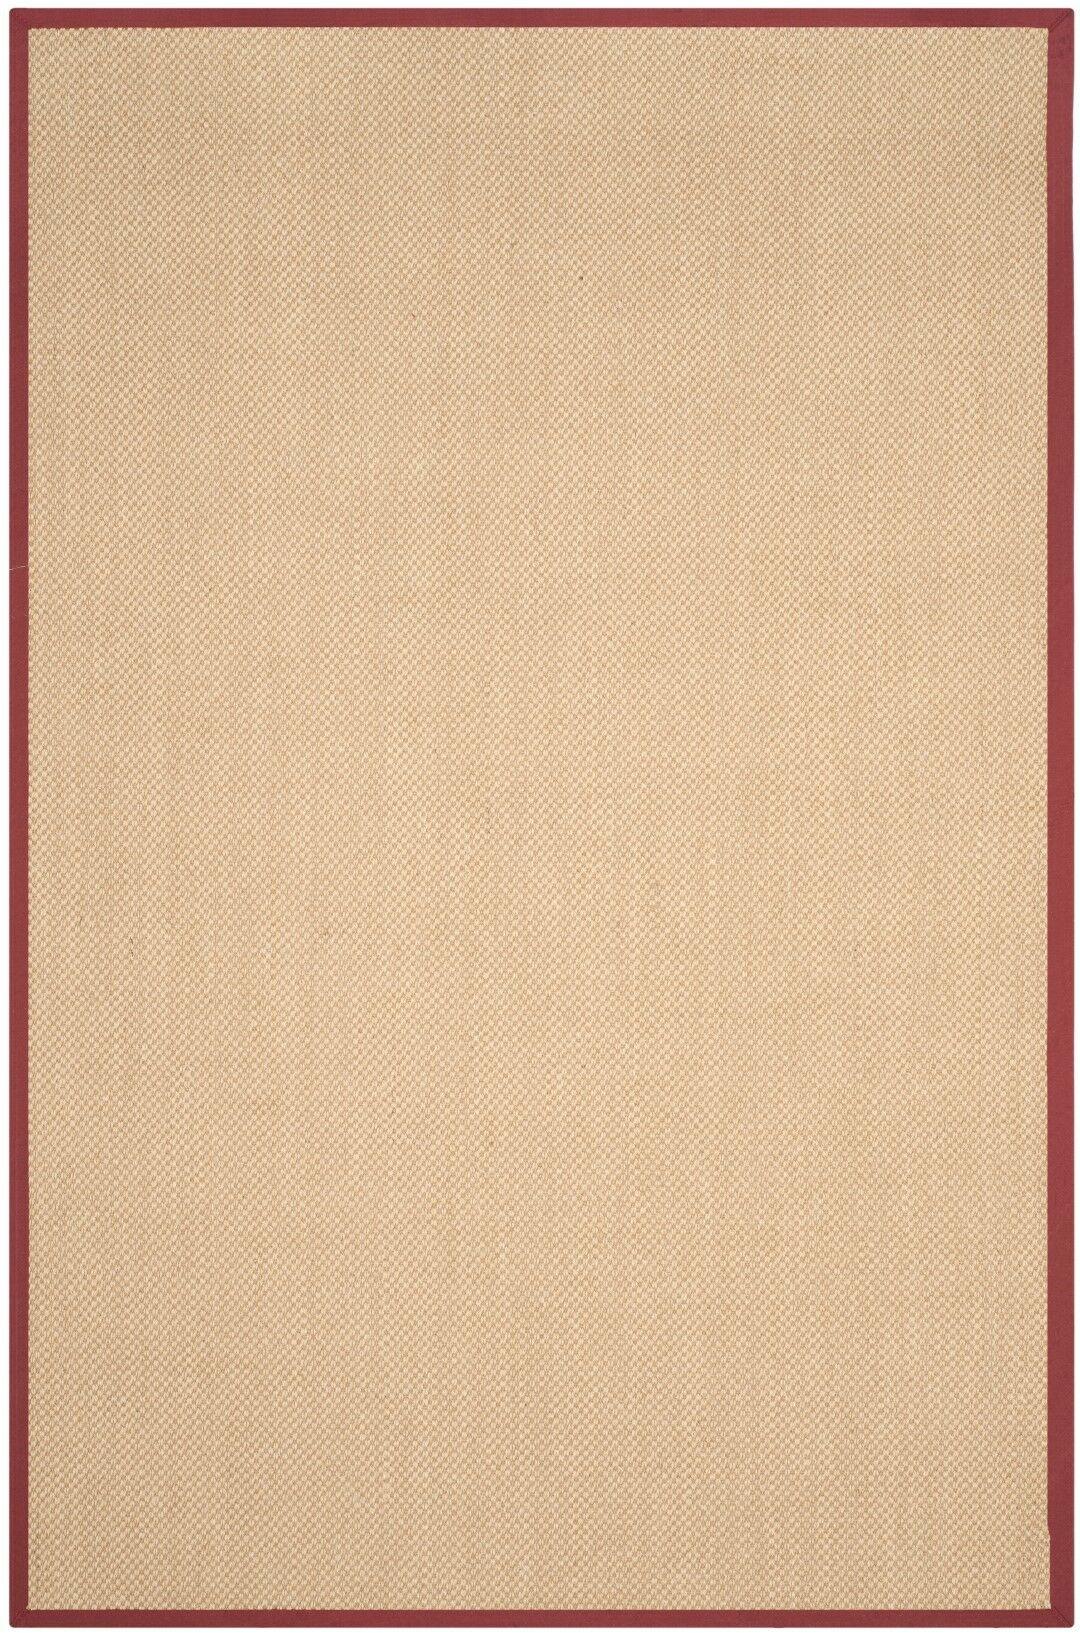 Hillsborough  Beige / Burgundy Area Rug Rug Size: Rectangle 5' x 8'